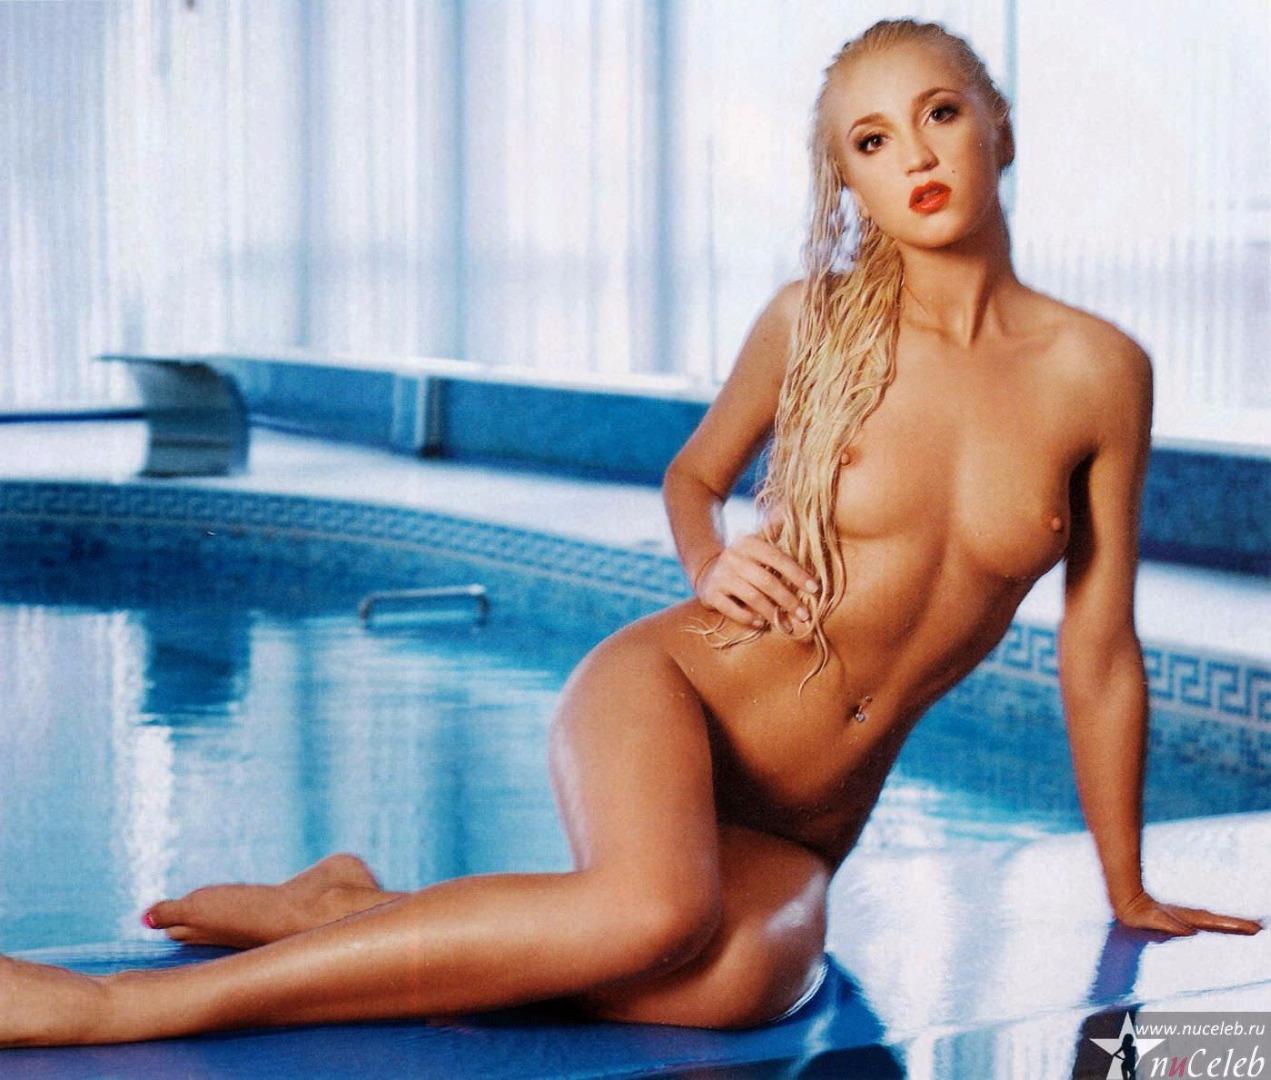 Ольга Бузова фото роскошной теледивы без купюр 40 фото